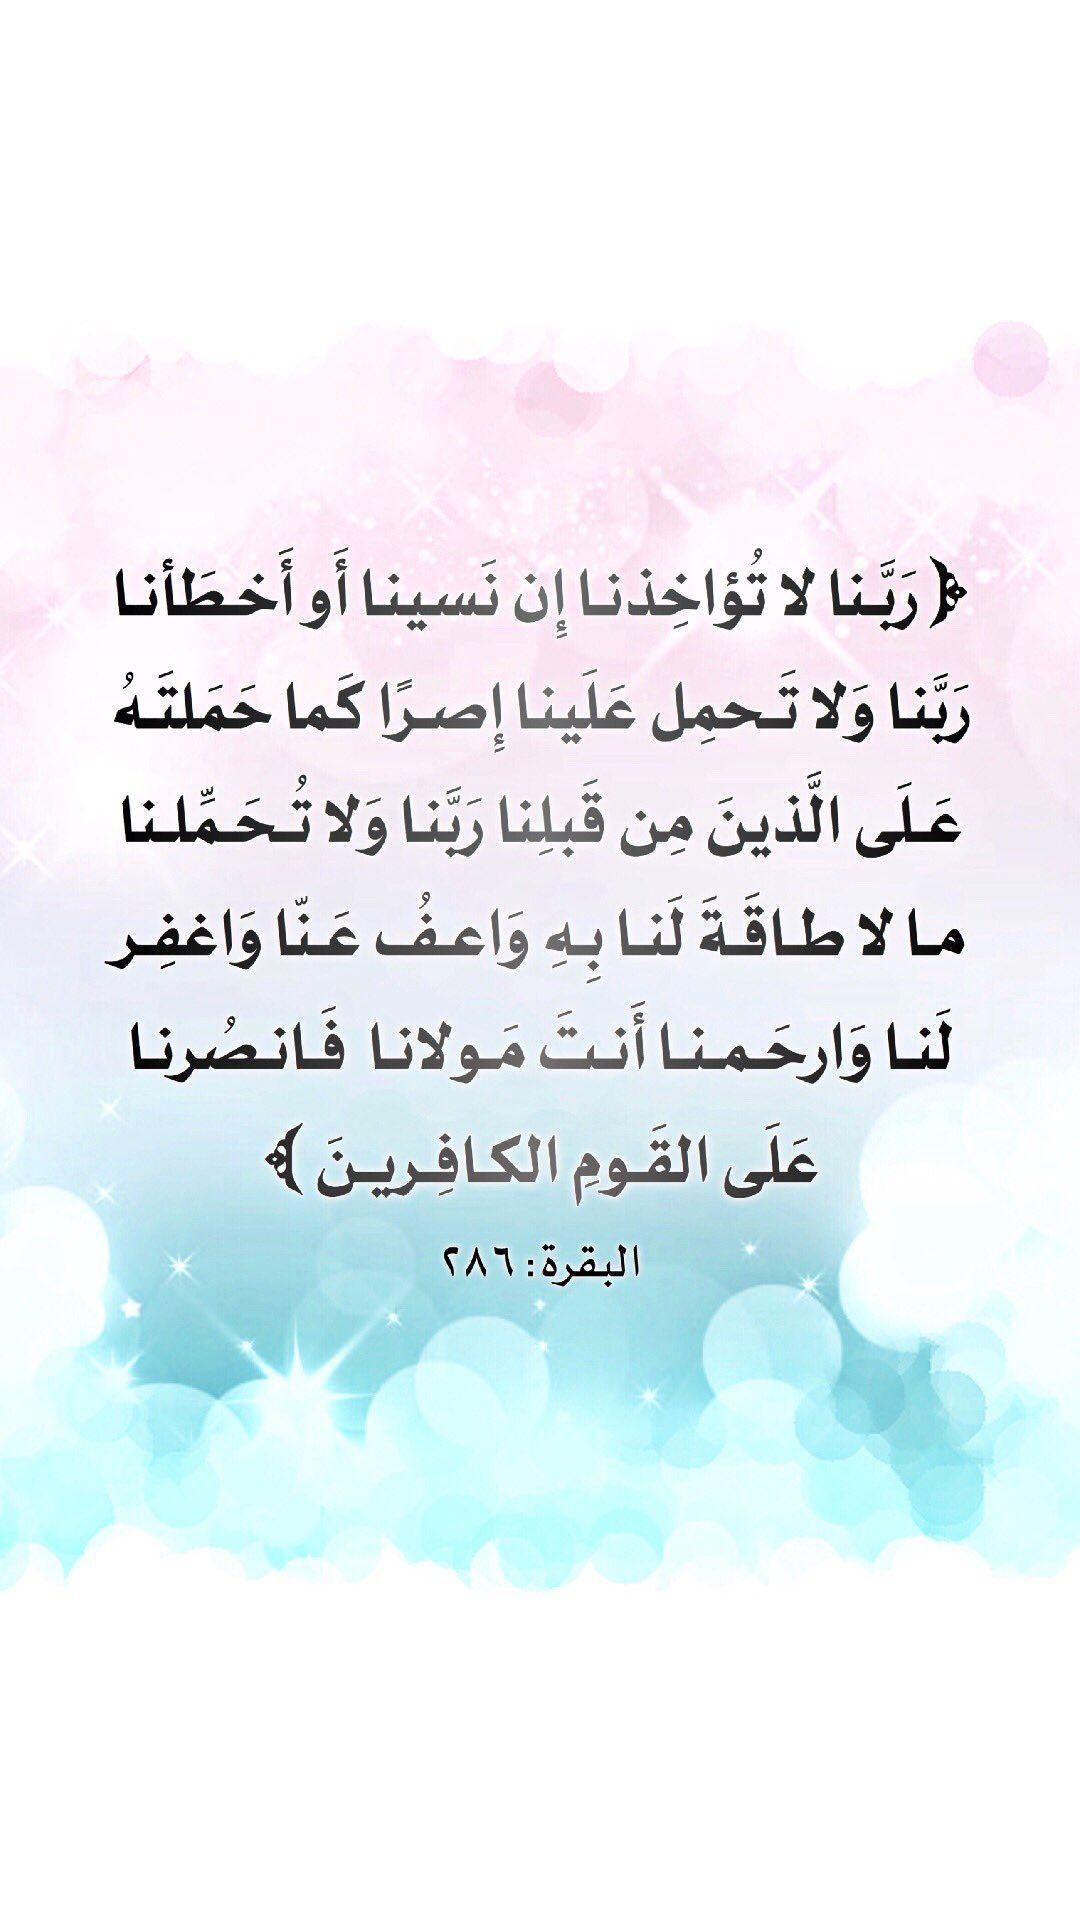 Pin By الأثر الجميل On آيات من القرآن الكريم Islam Quran Quran Islam